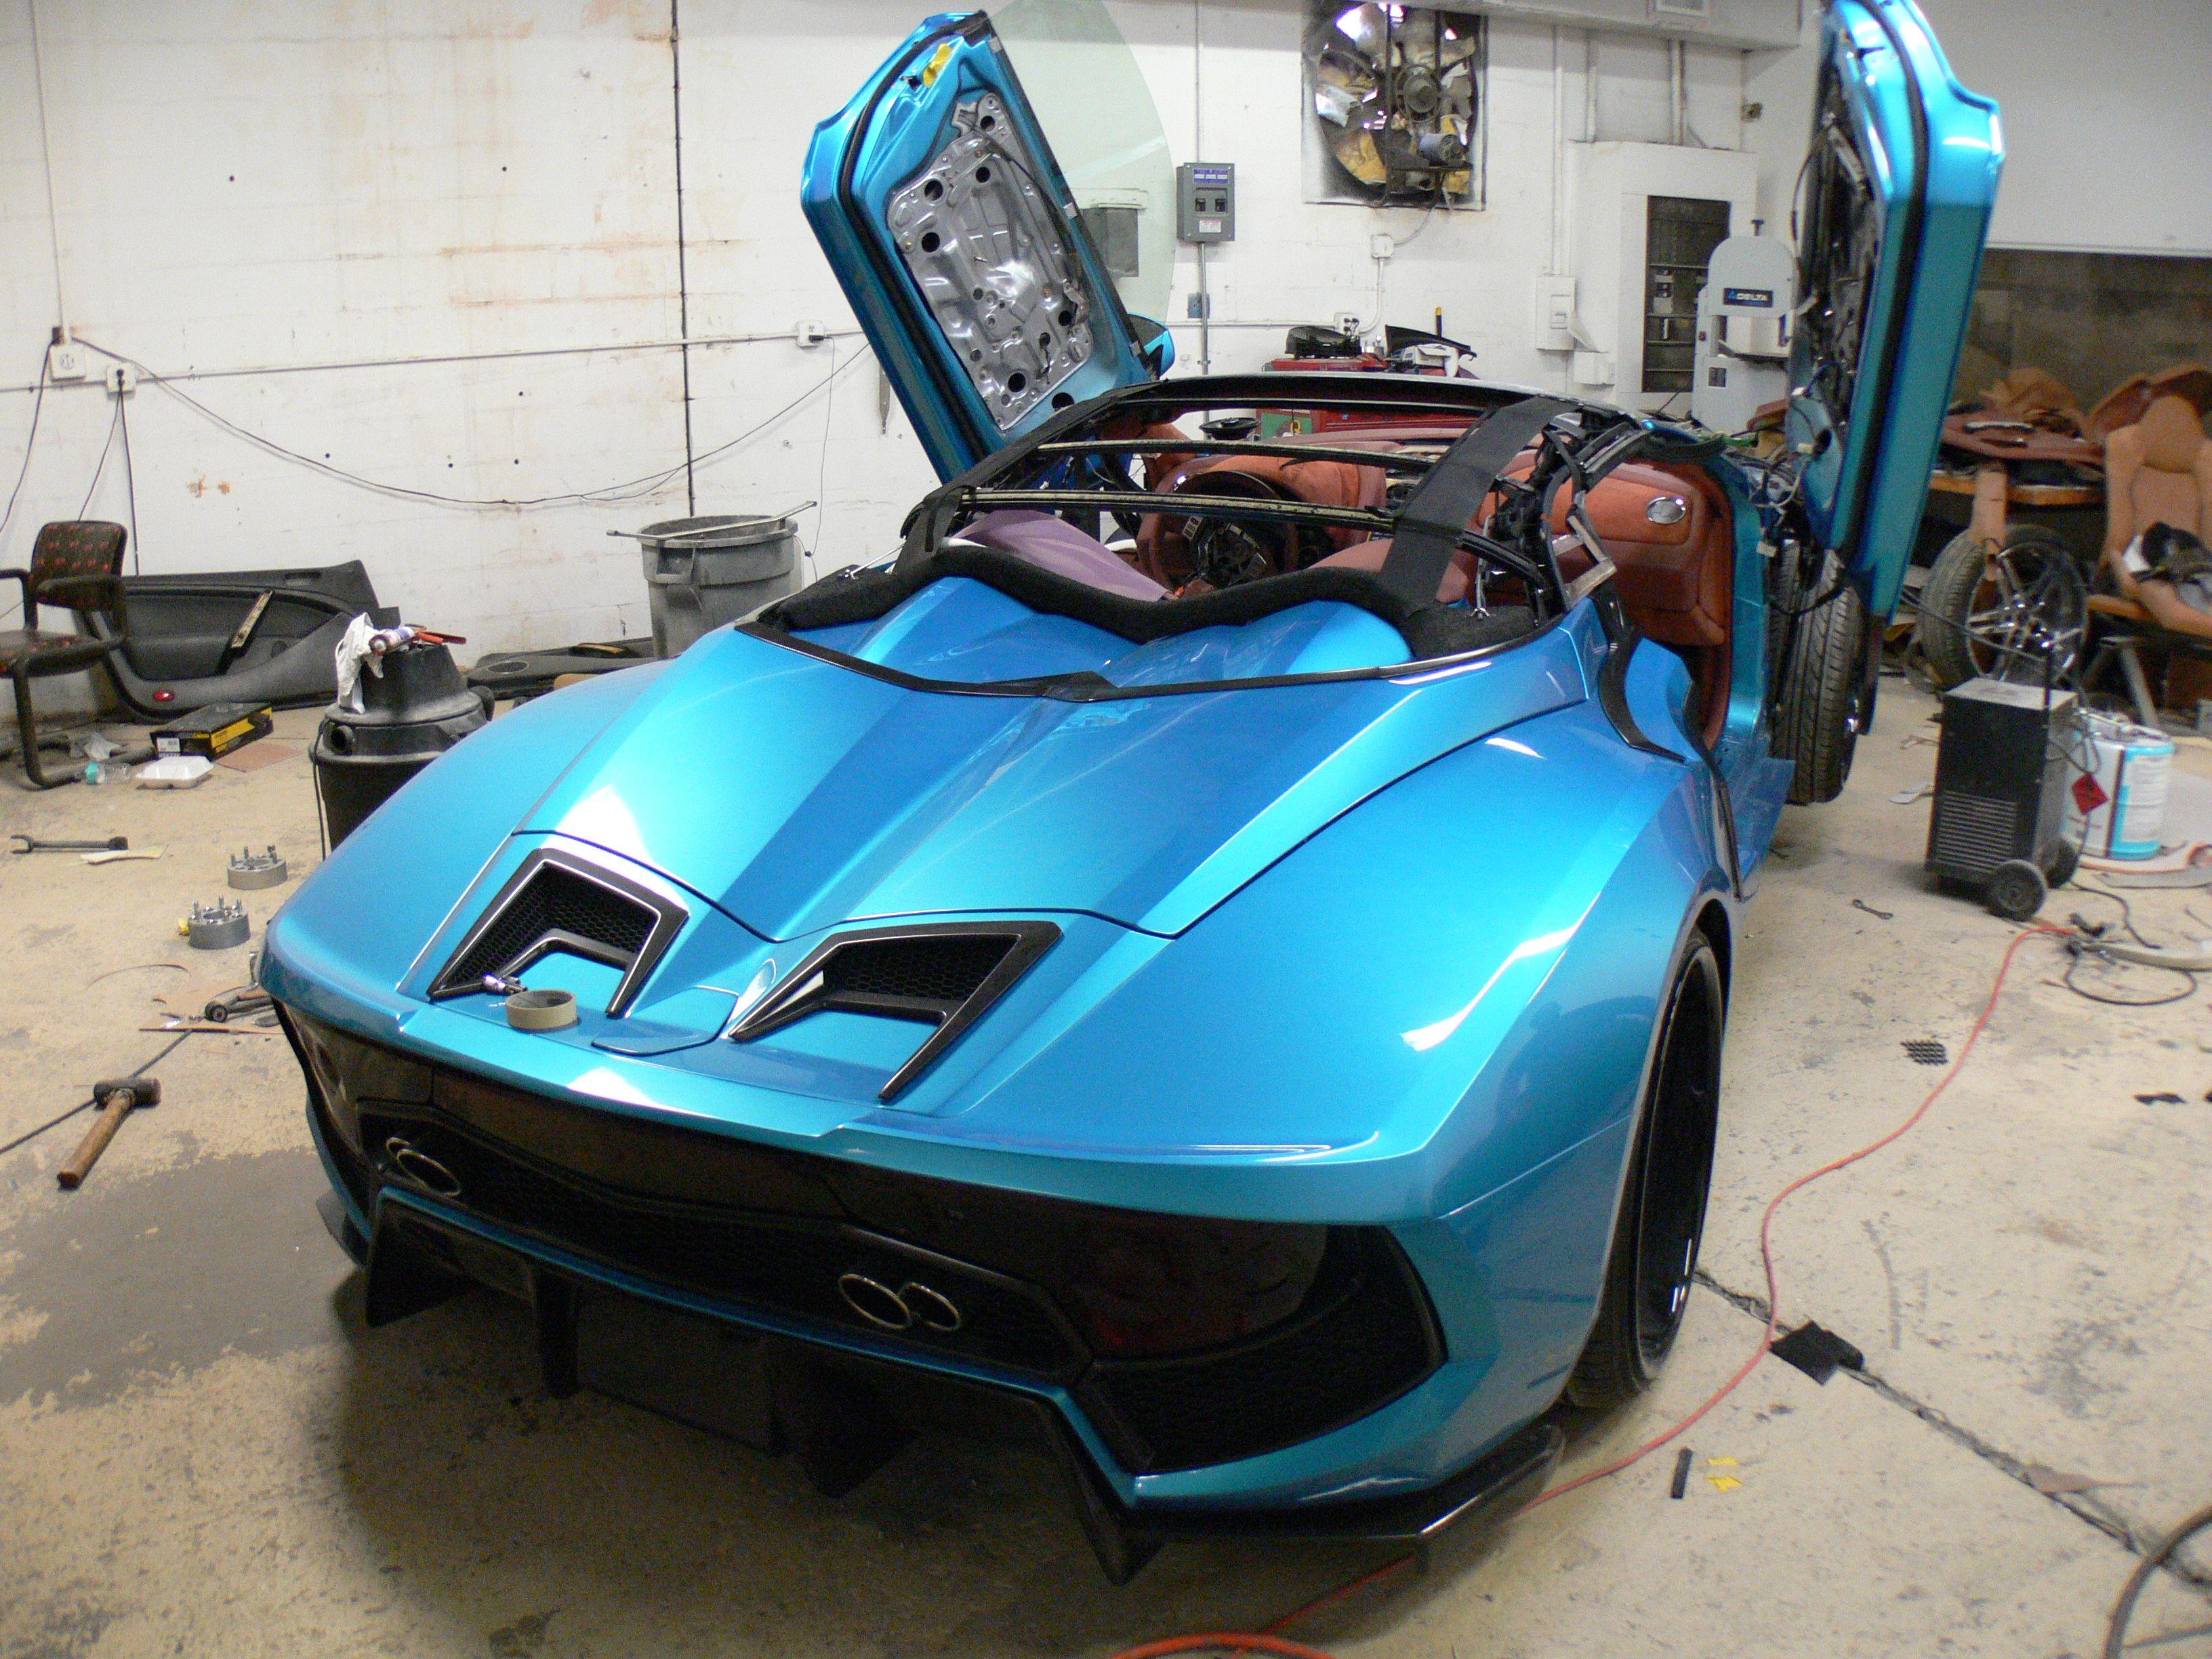 This Is A Convertible Vaydor Kit Car Kit Cars Custom Cars Dream Cars